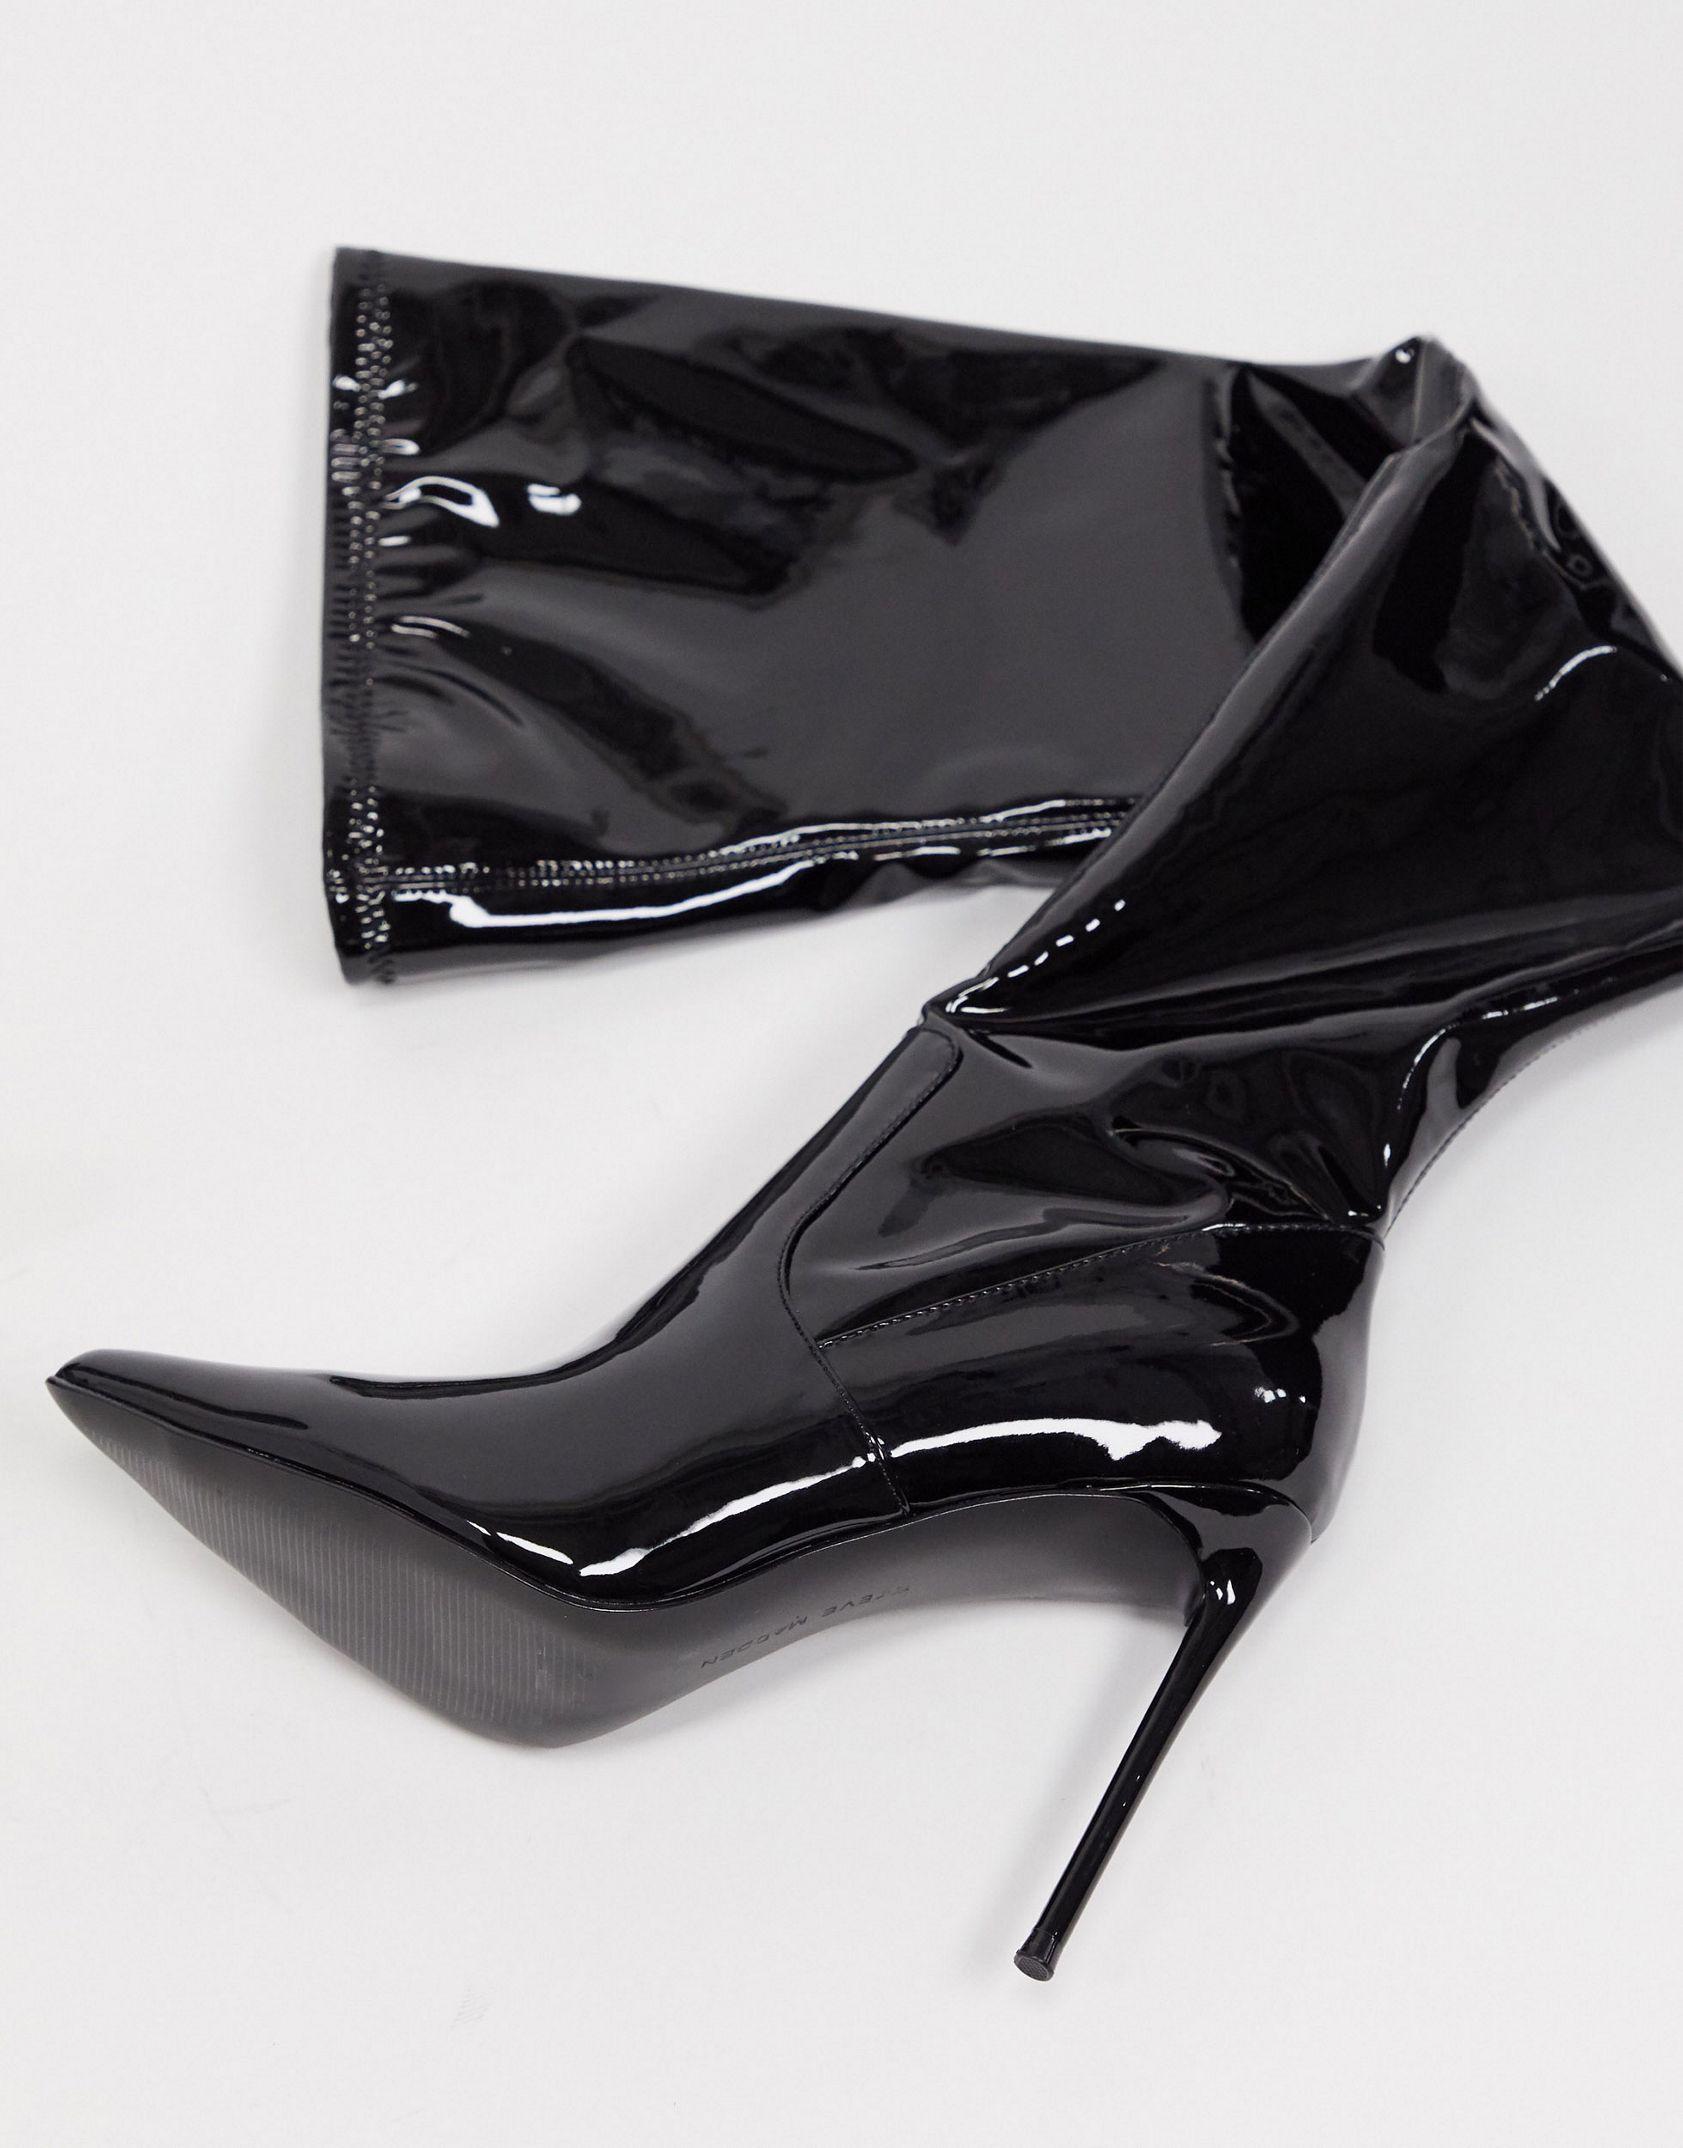 Steve Madden Vava thigh high boot in black patent -  Price Checker